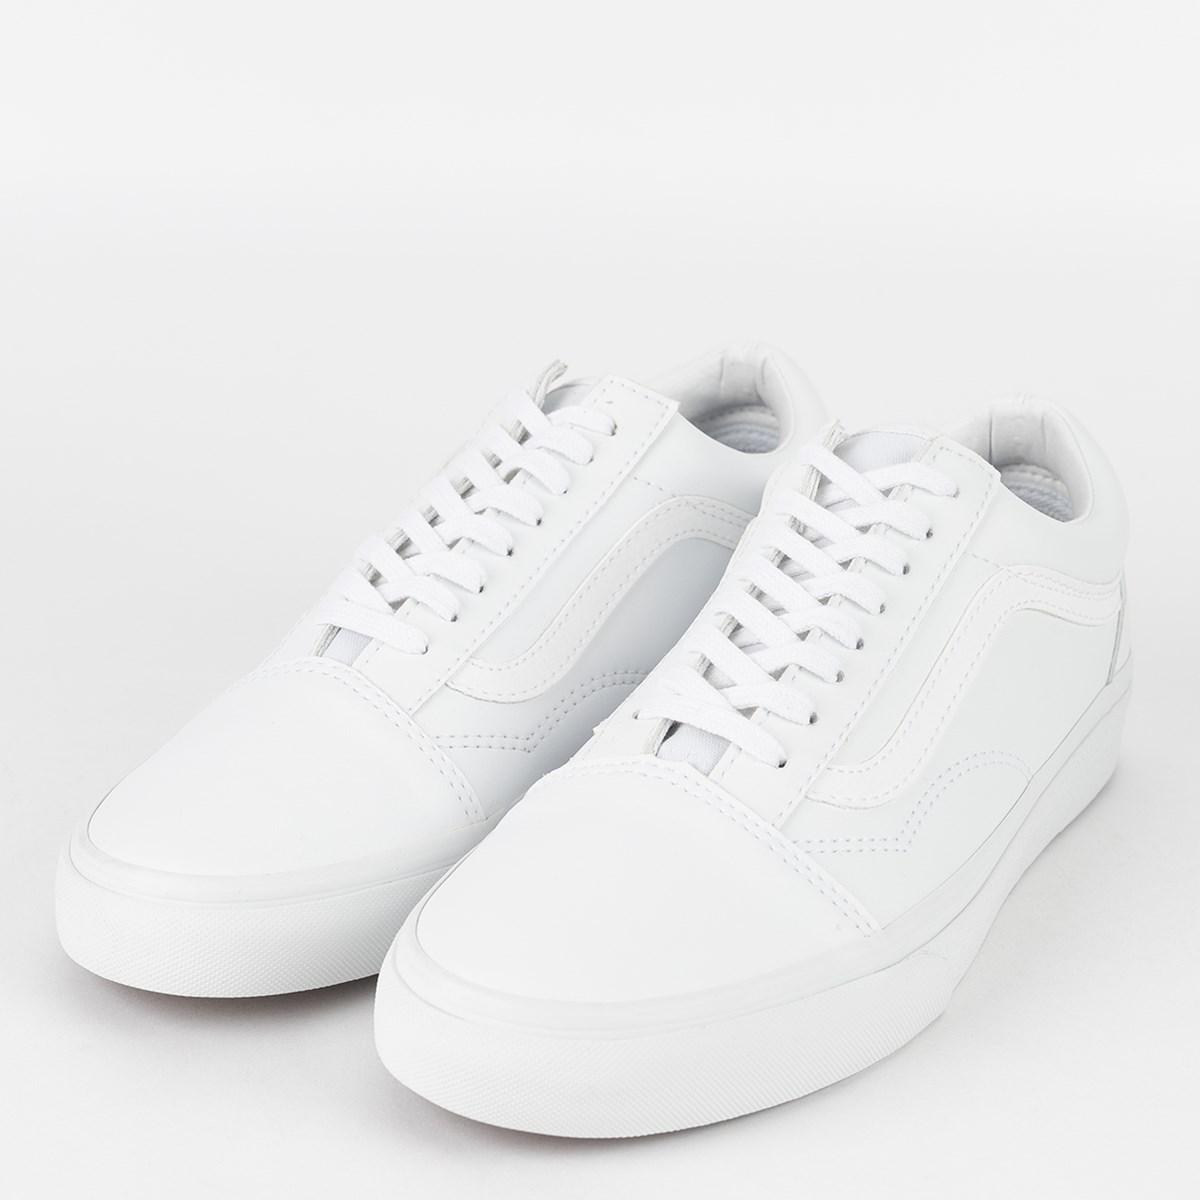 Tênis Vans Old Skool Classic Tumble True White VN0A38G1ODJ